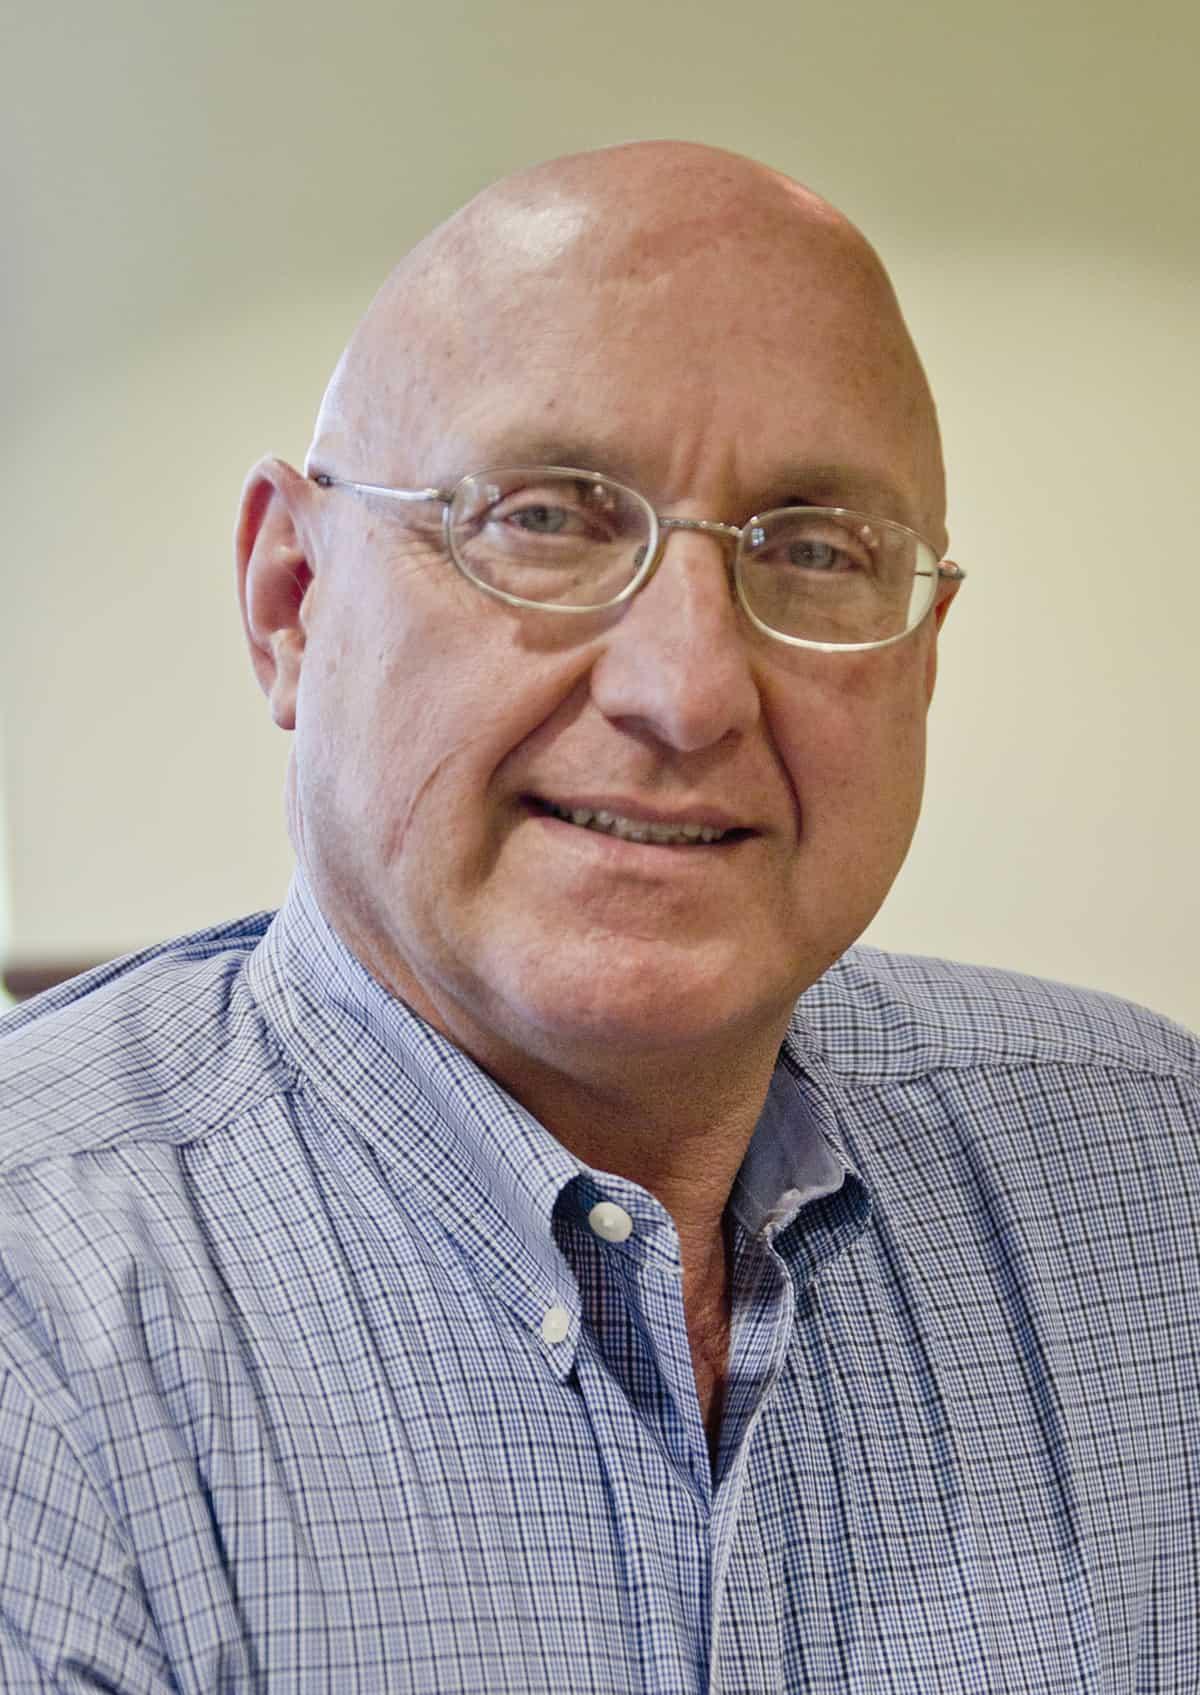 Paul Grahovac